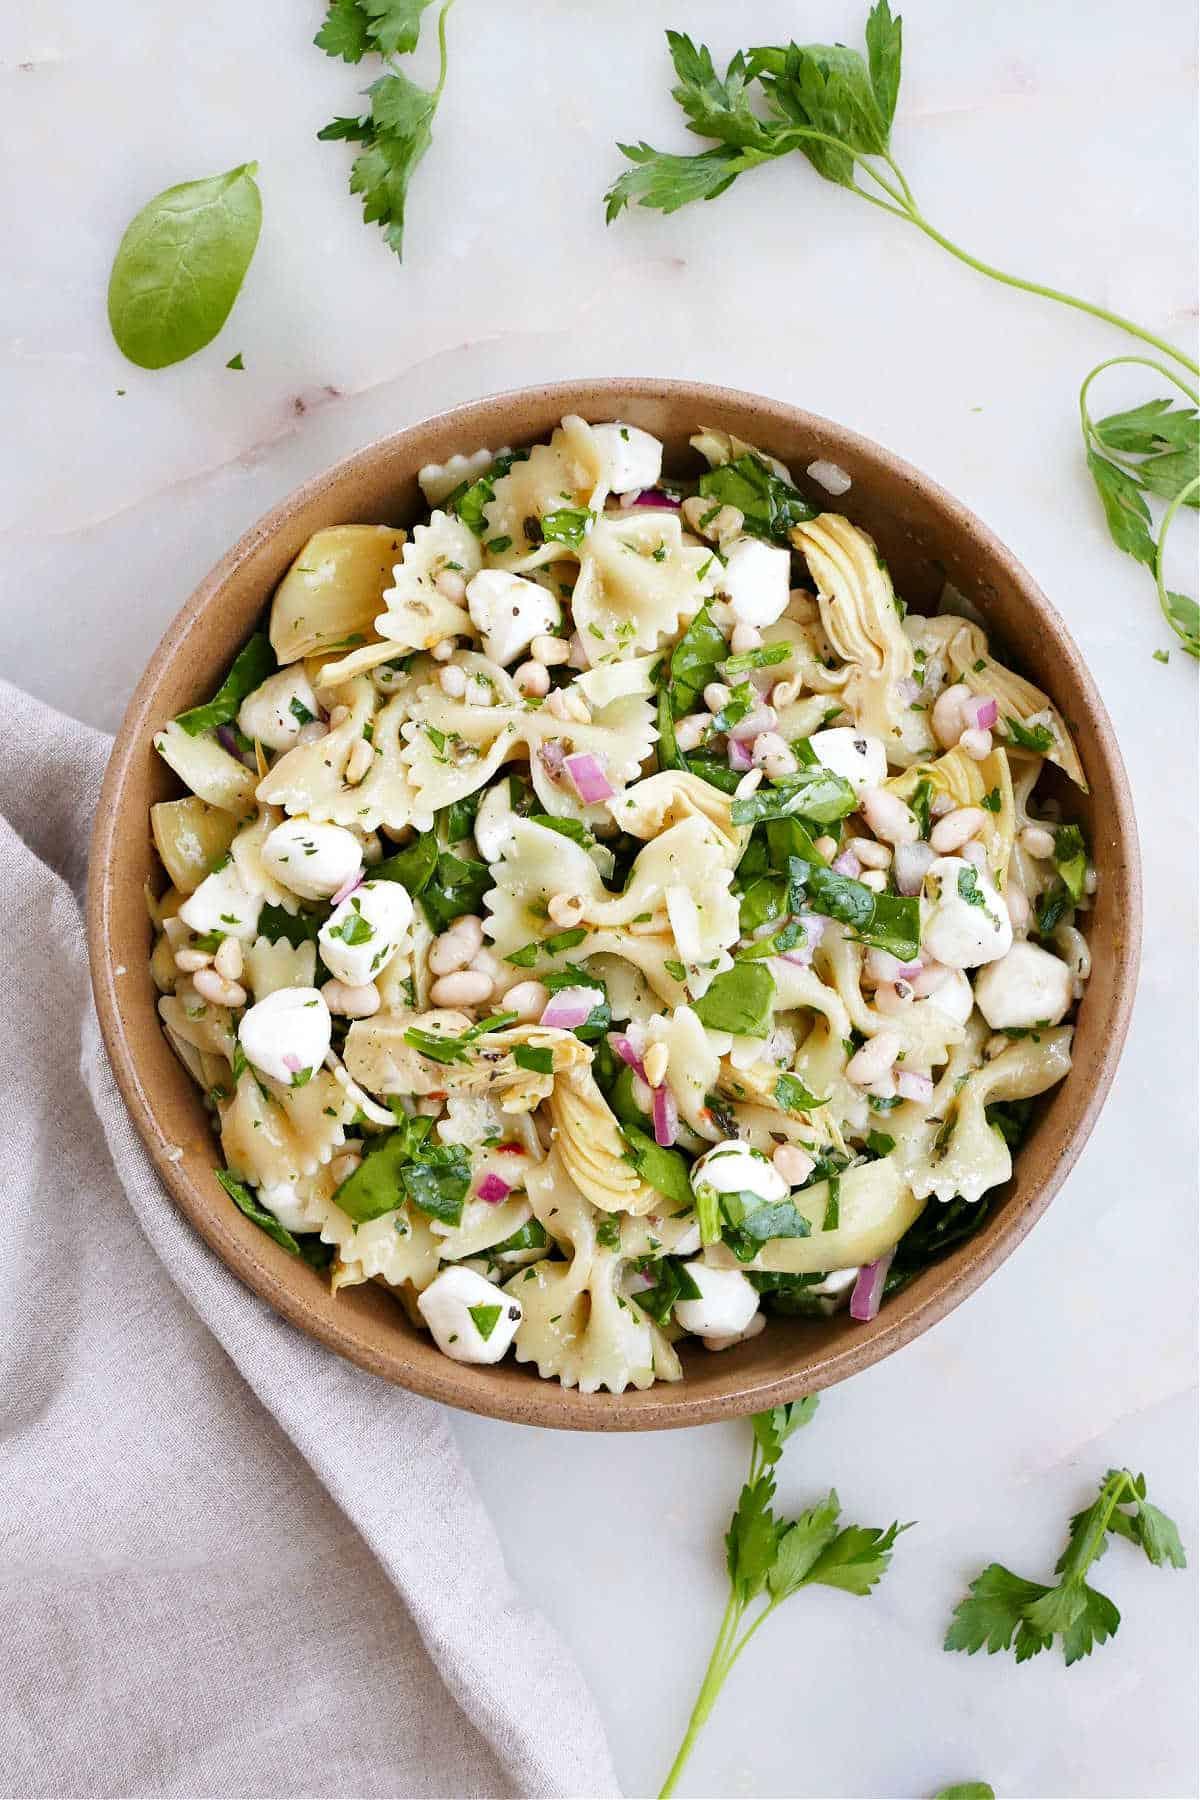 spinach artichoke pasta salad